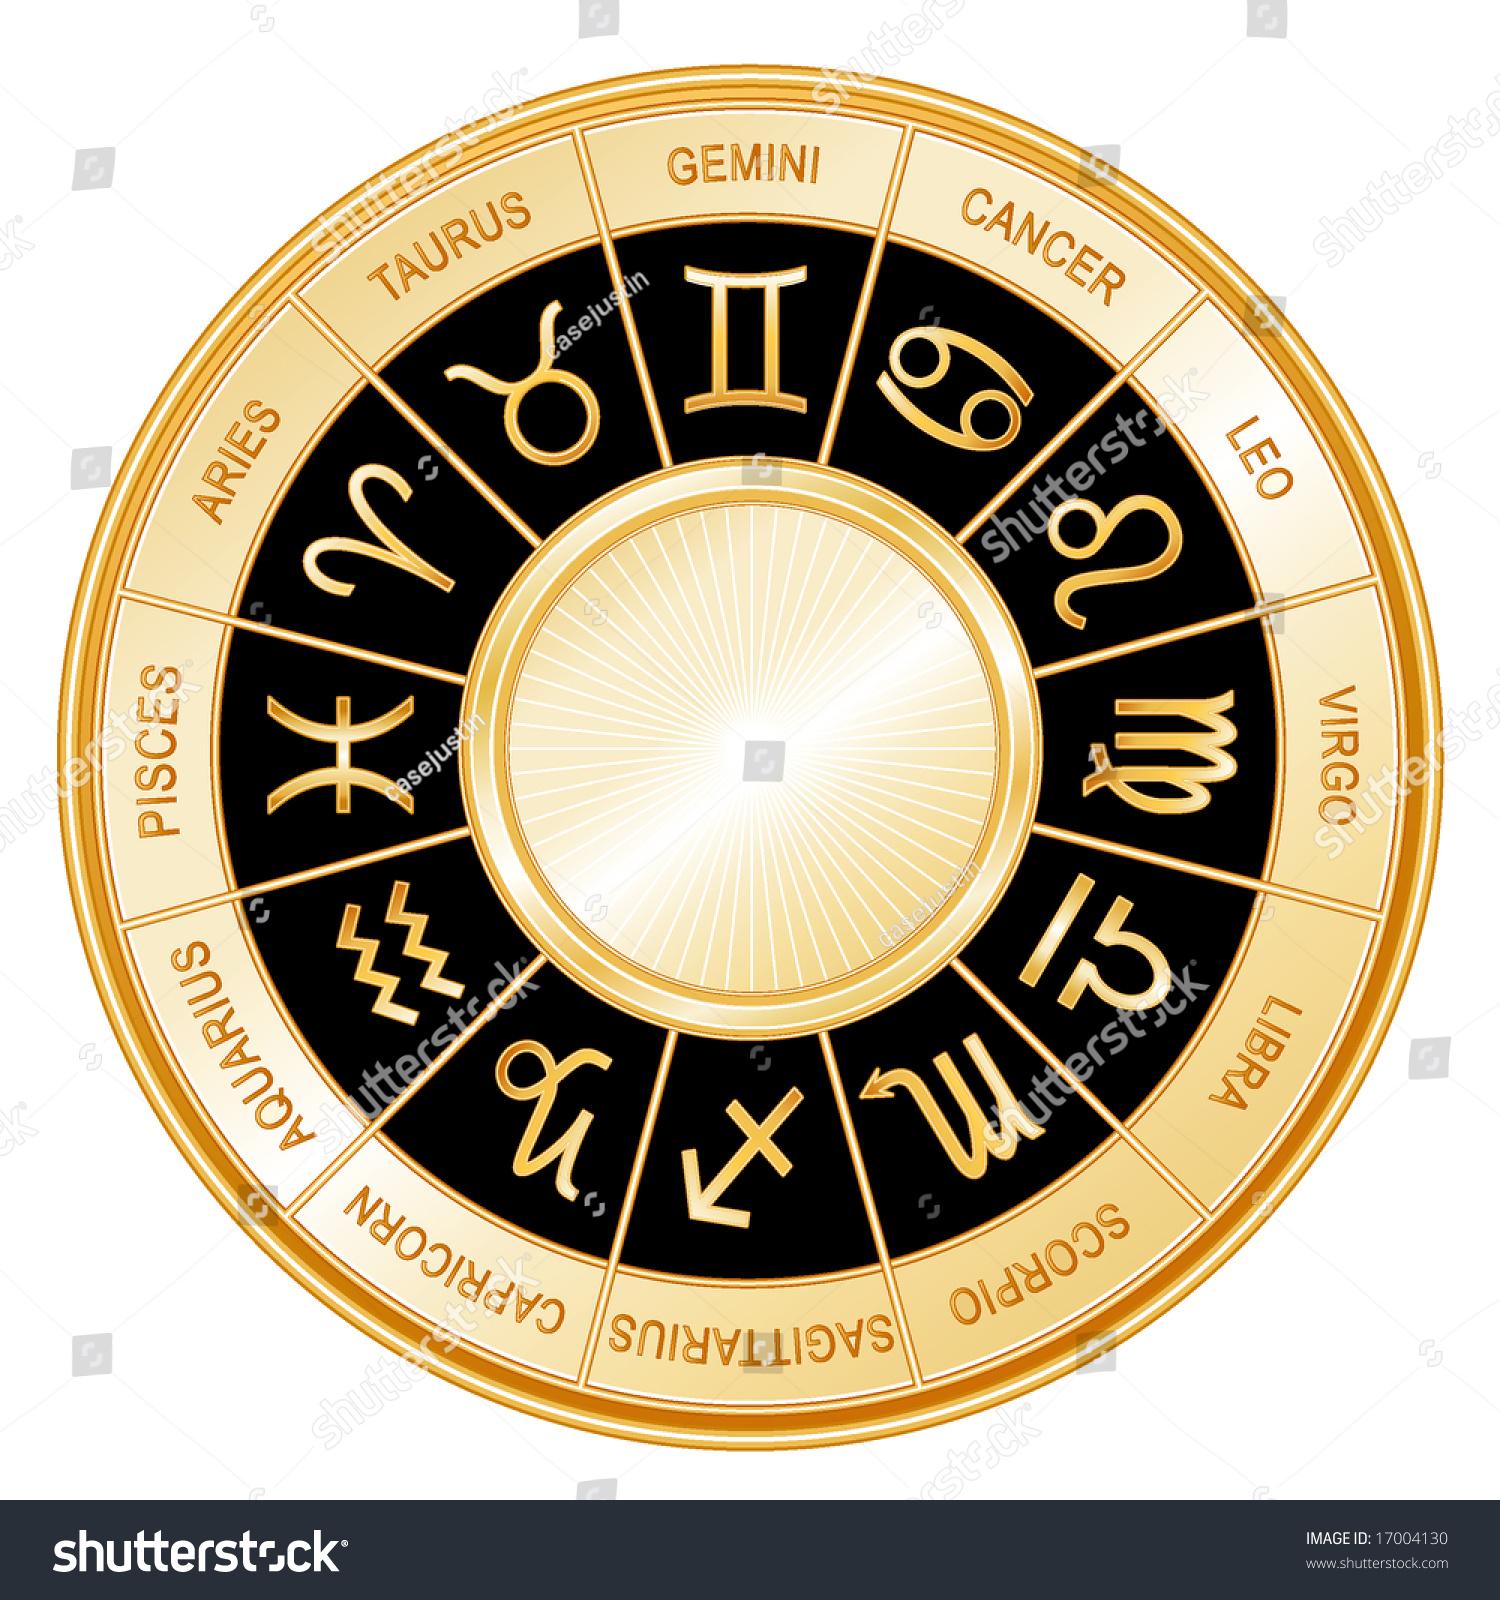 horoscope wheel 12 astrological signs zodiac stock illustration 17004130 shutterstock. Black Bedroom Furniture Sets. Home Design Ideas